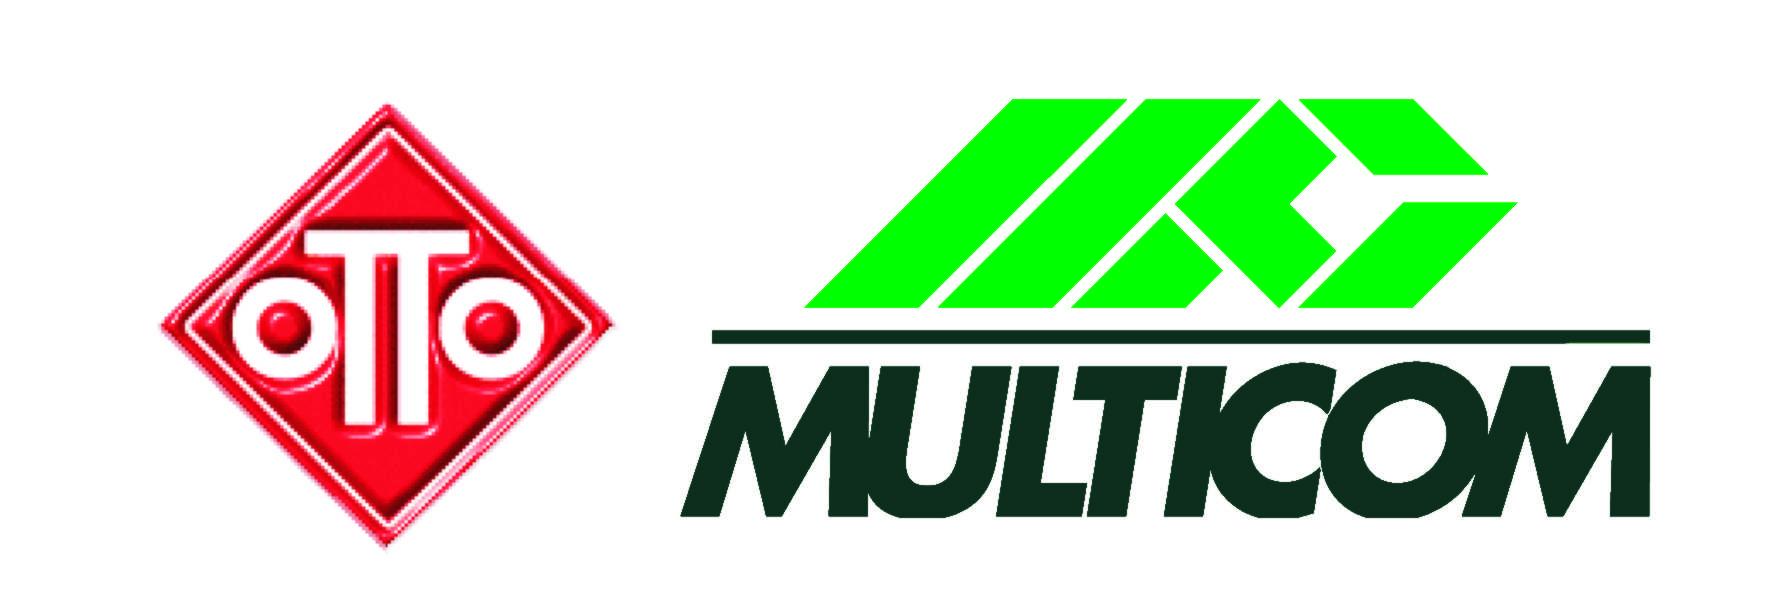 otto-multicom-srl